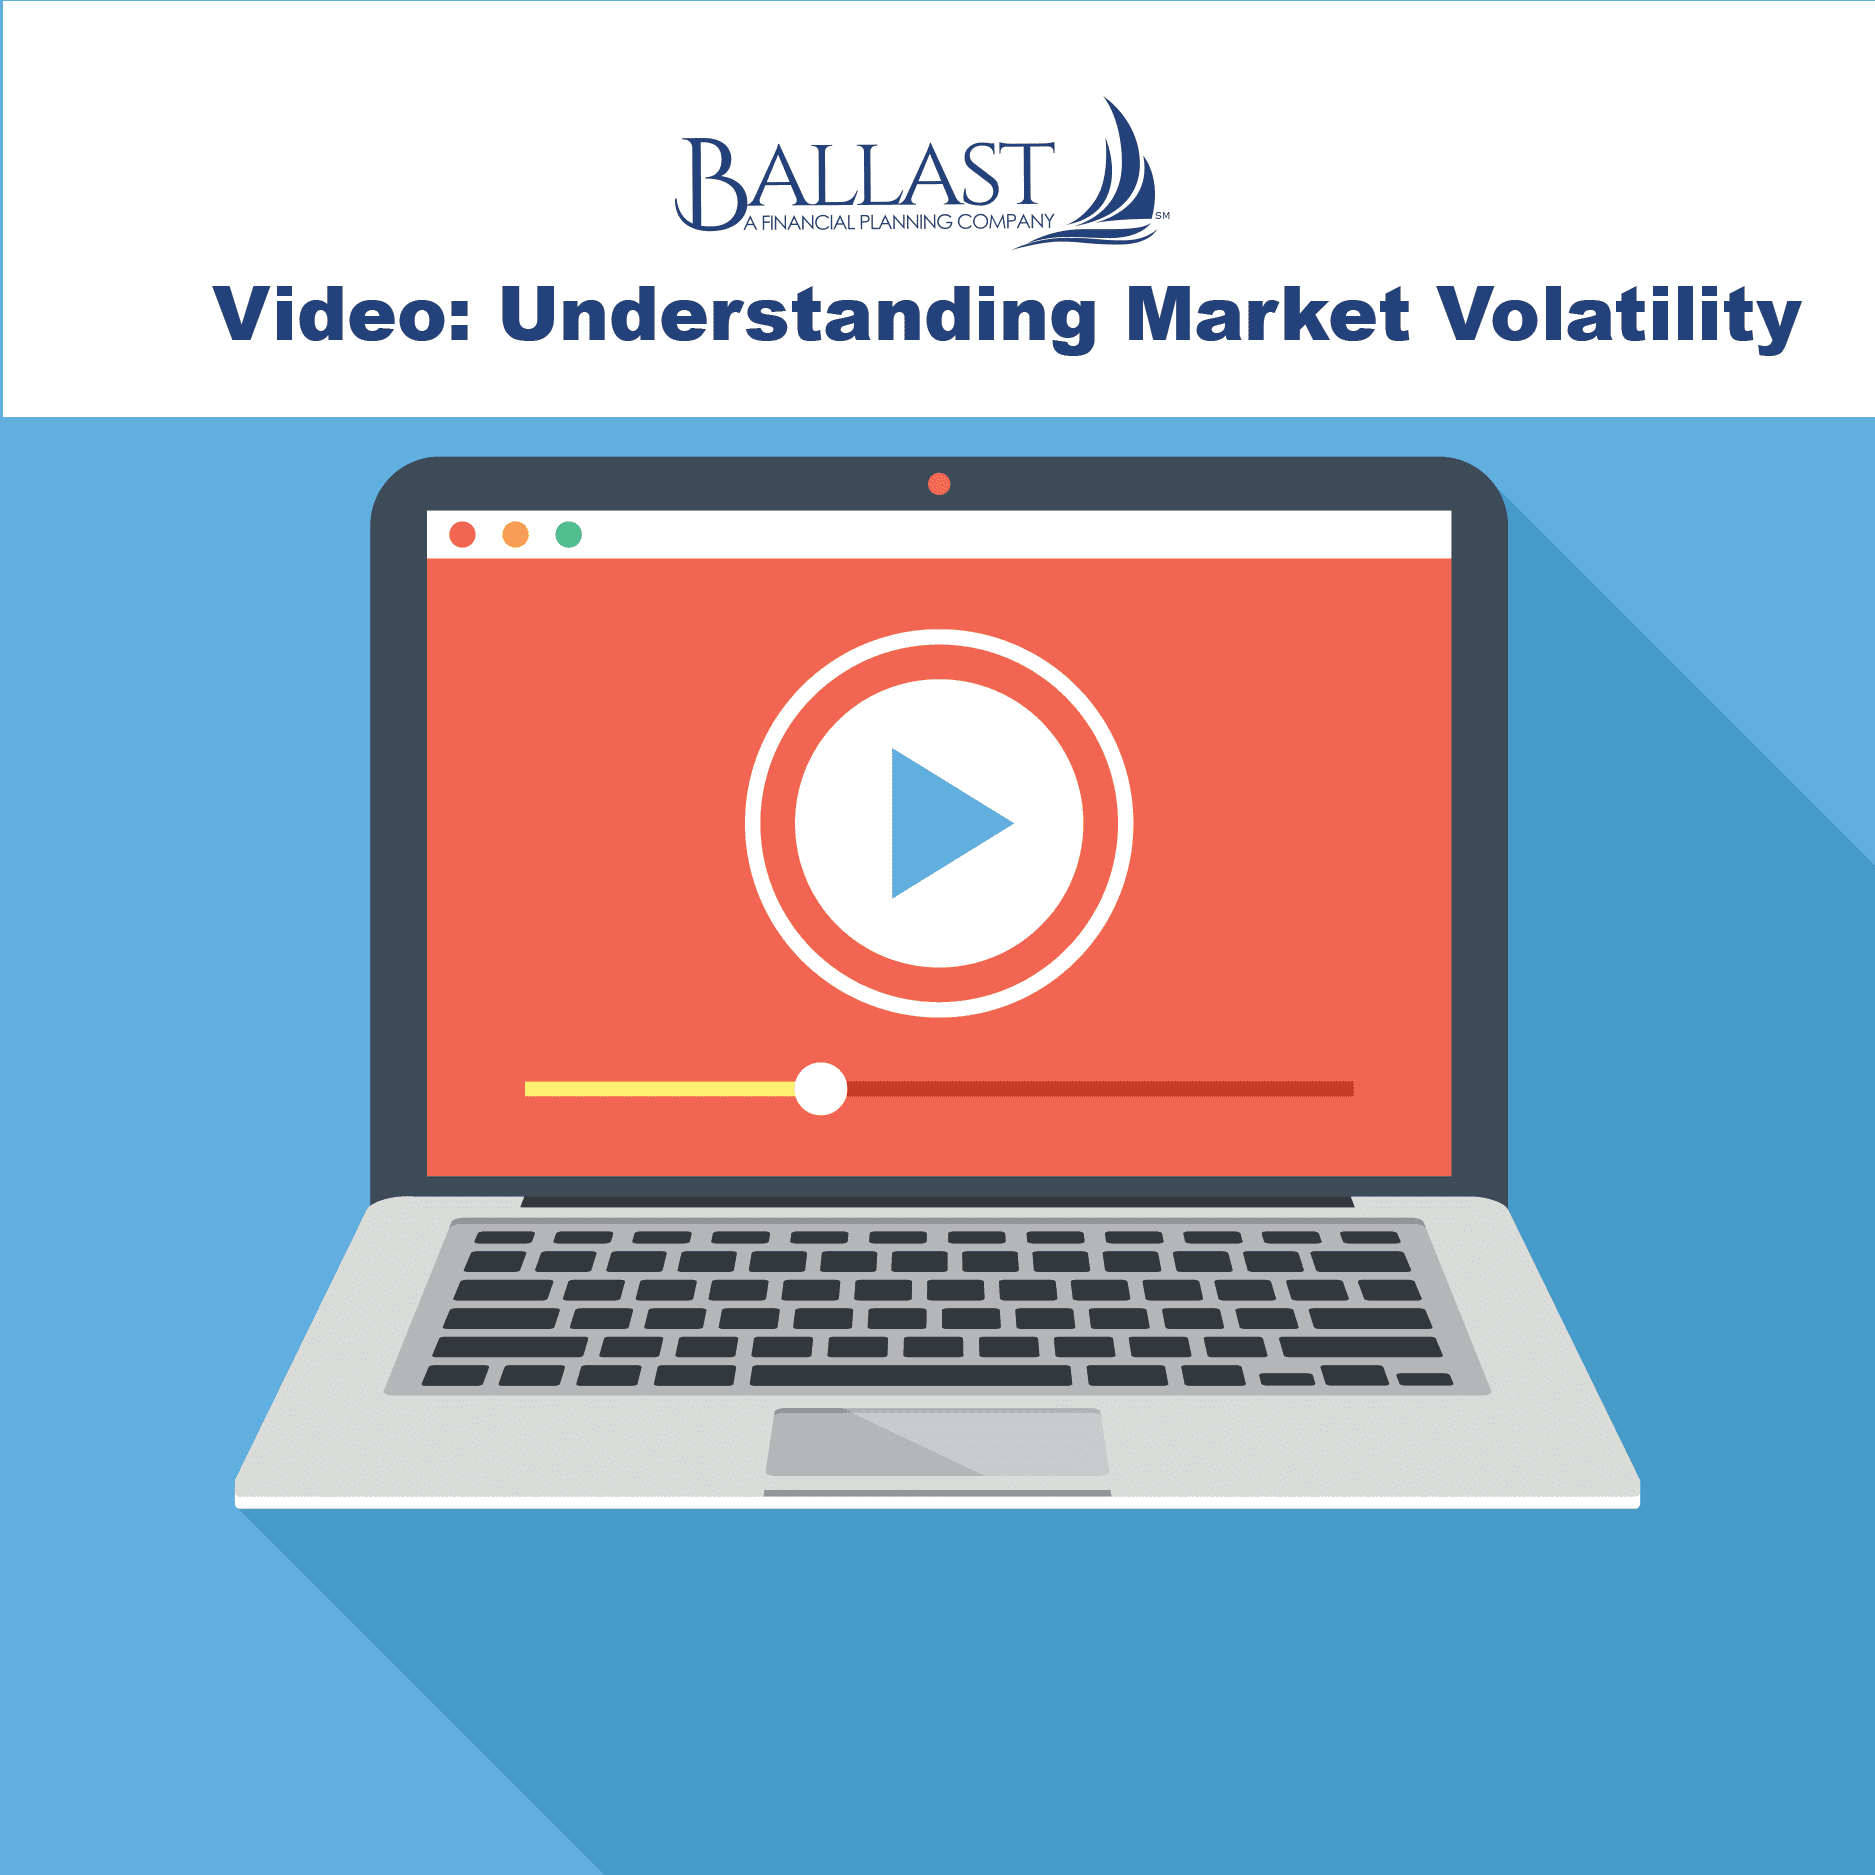 Ballast Advisors Video: Understanding Market Volatility